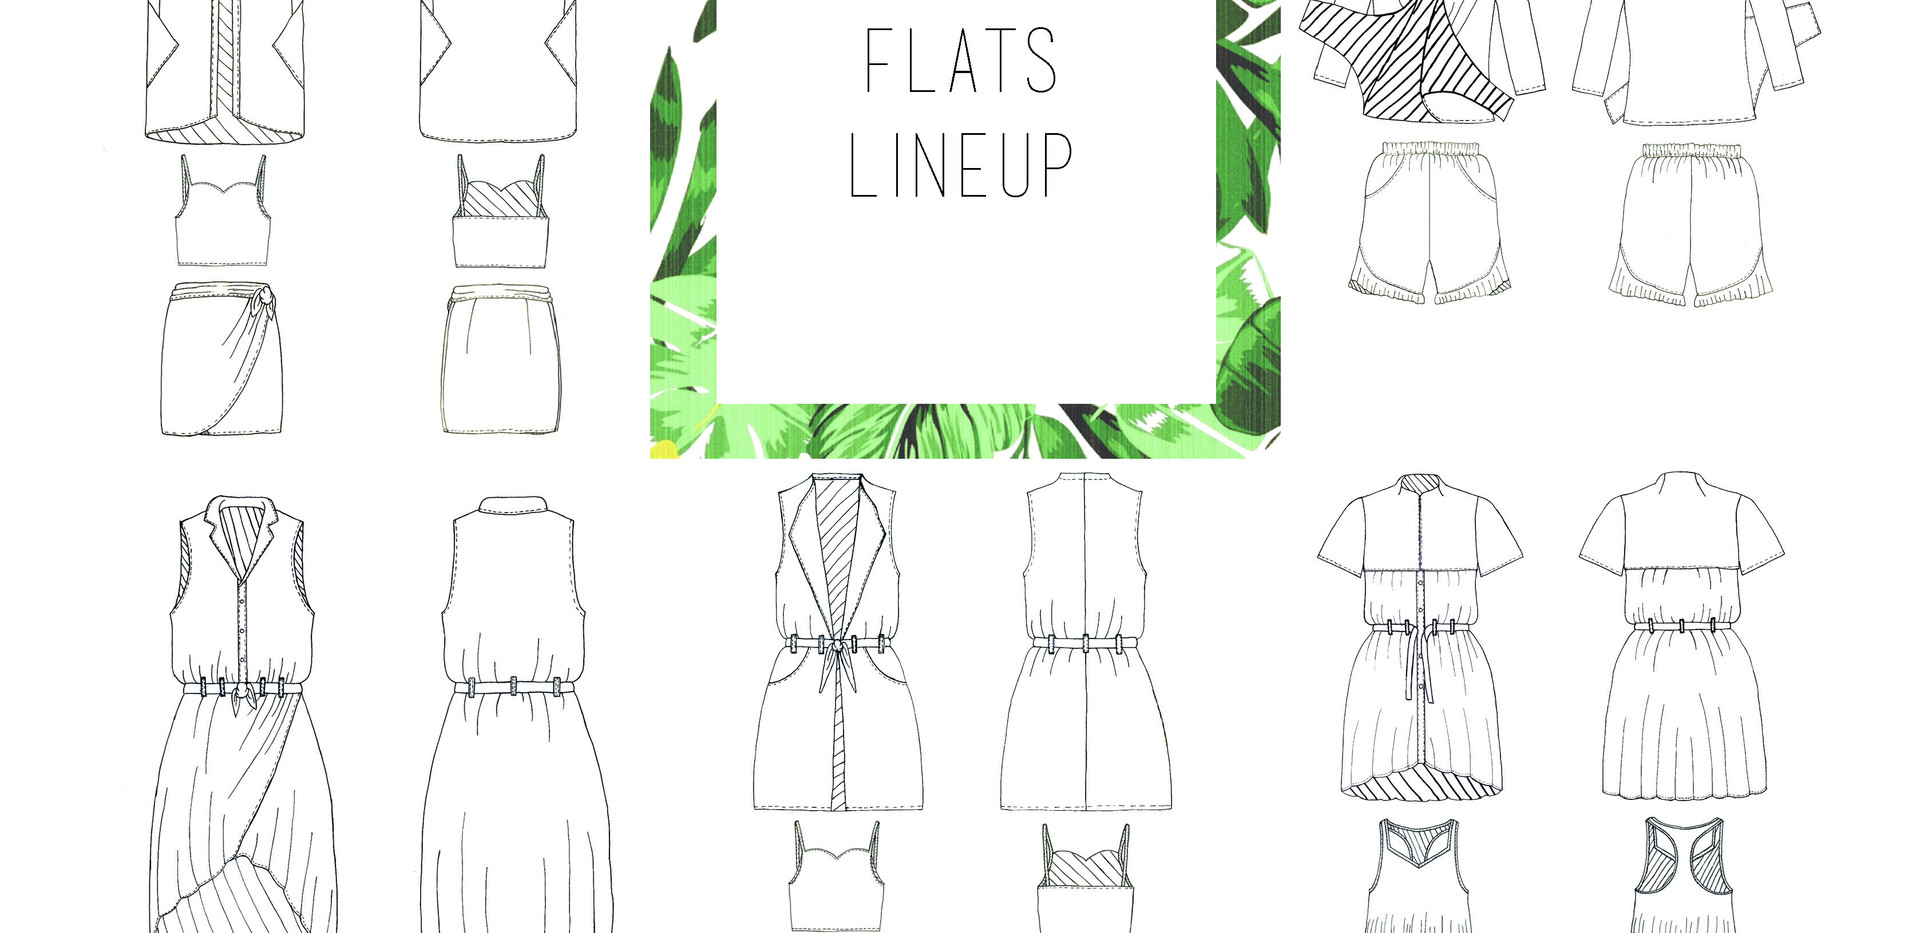 Flats Line up